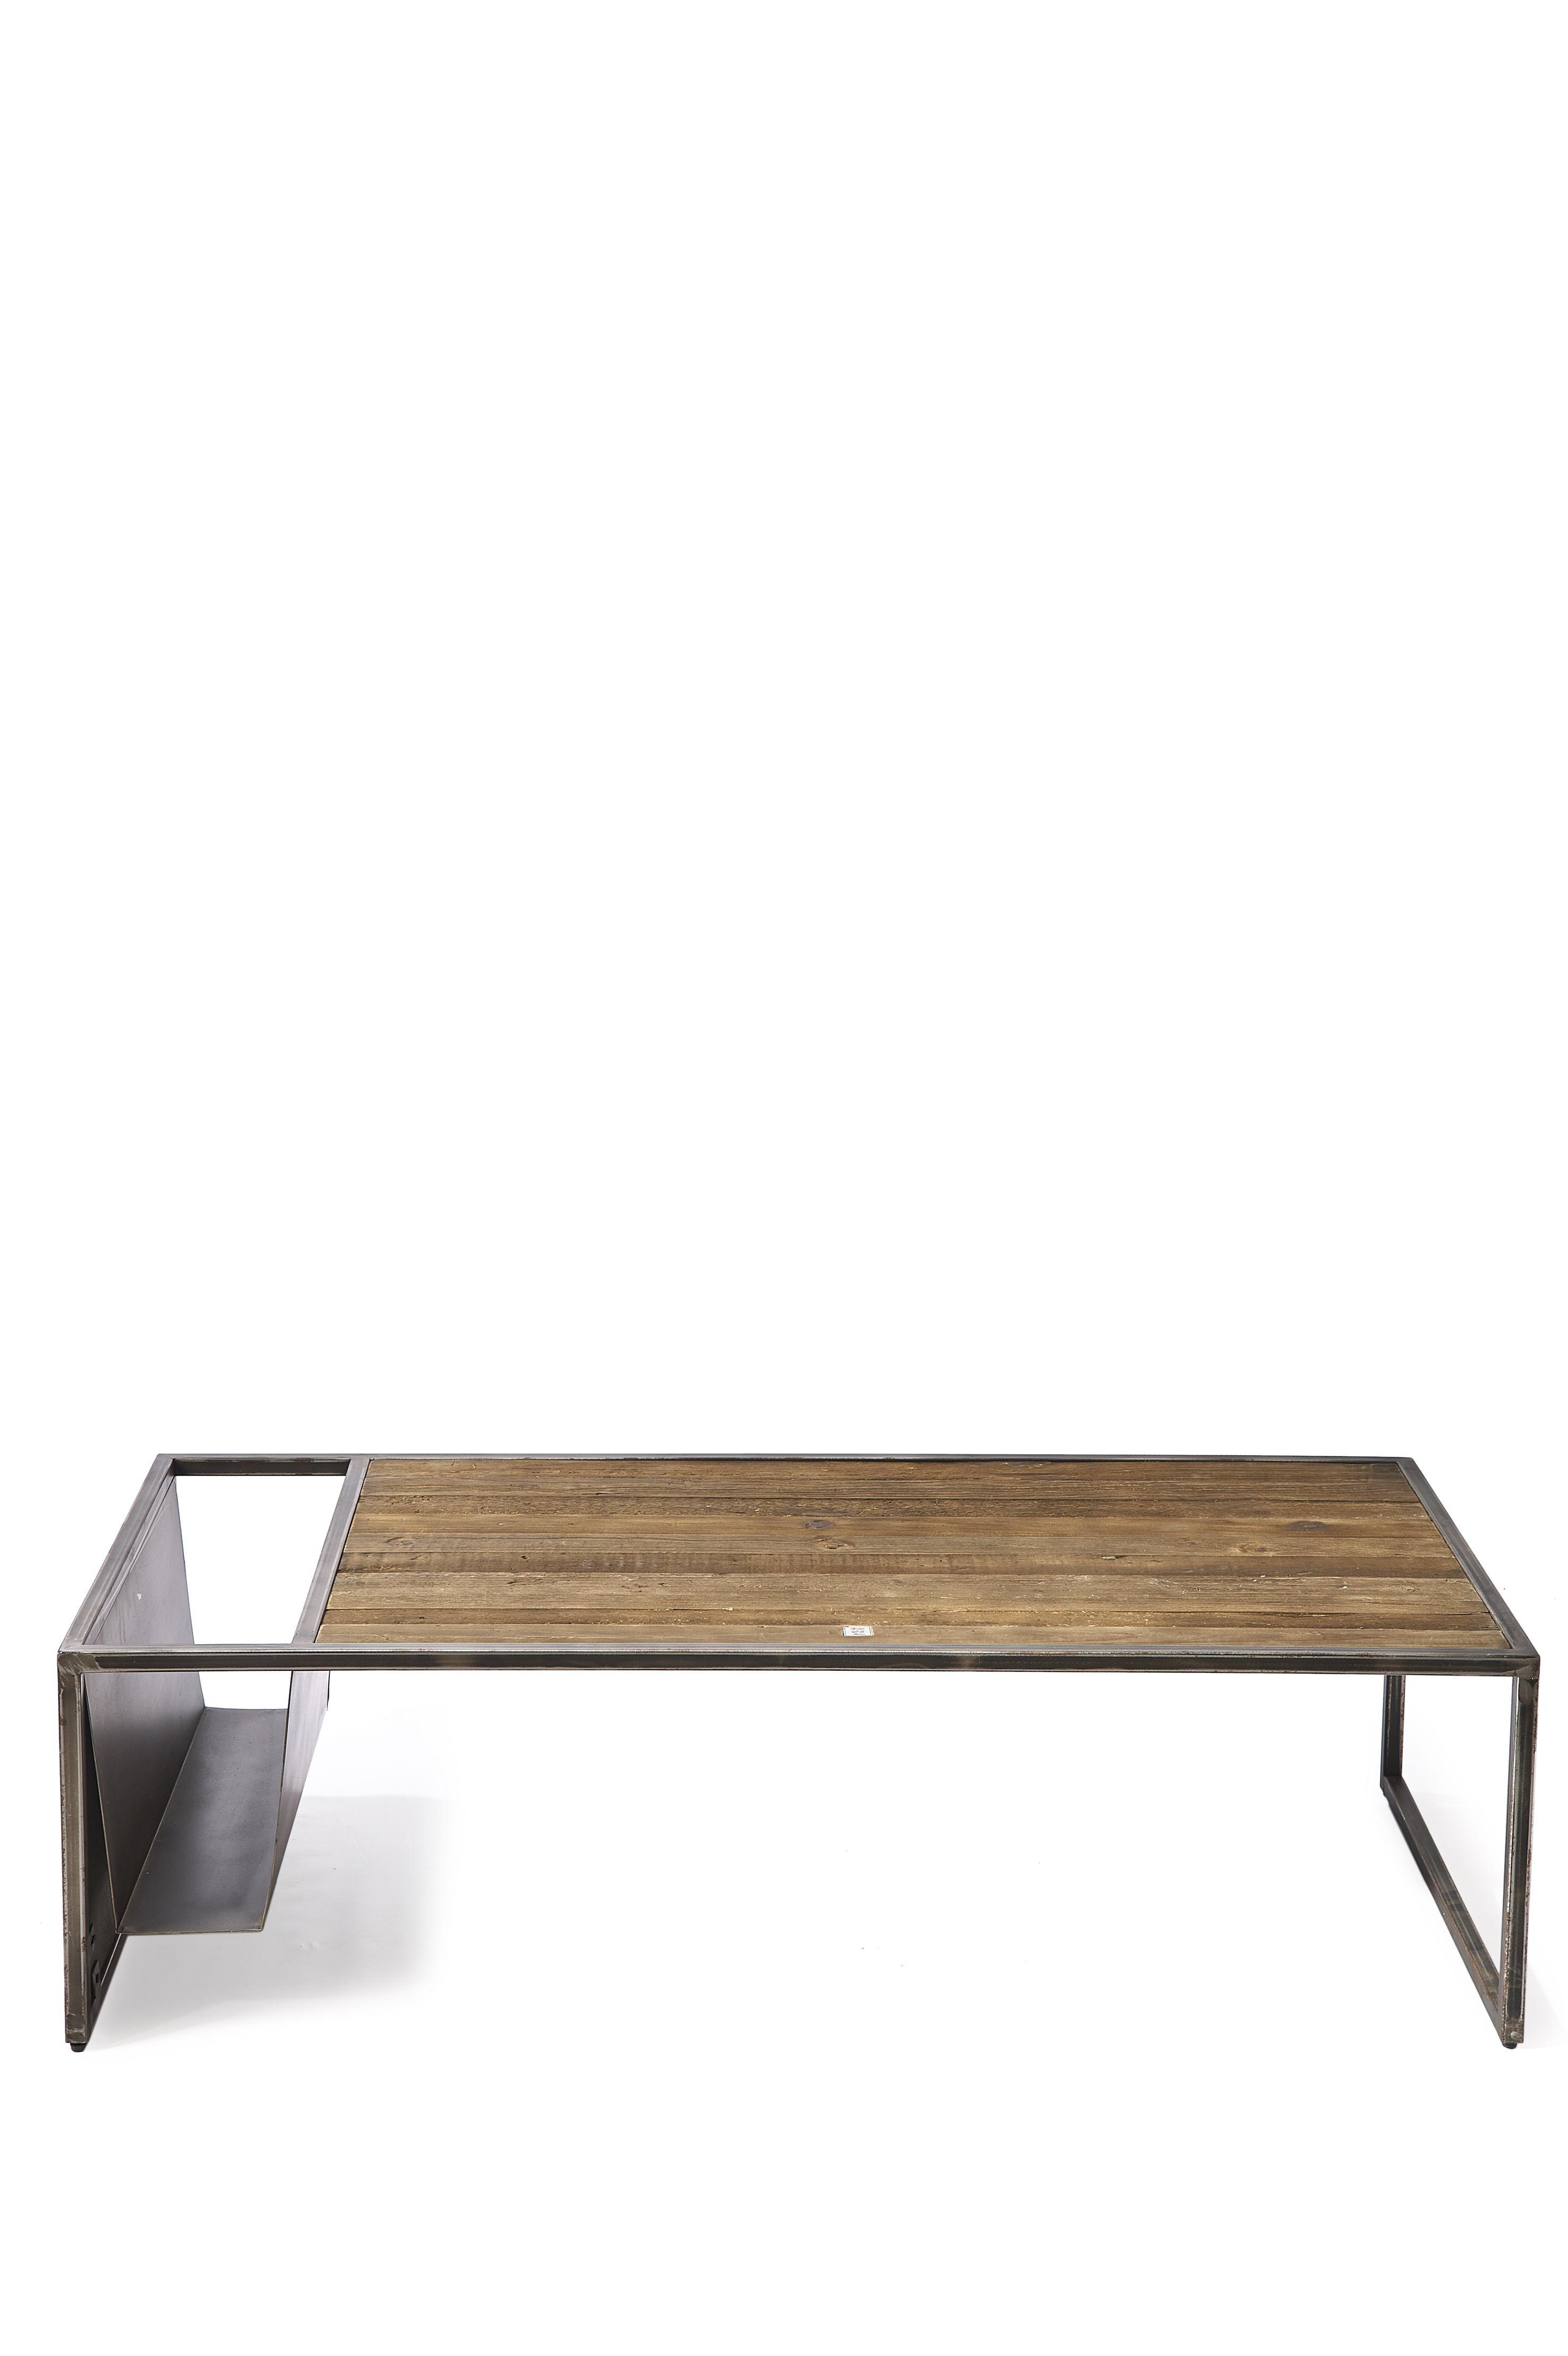 Le Bar Americain Coffee Table 130x60 cm / Rivièra Maison